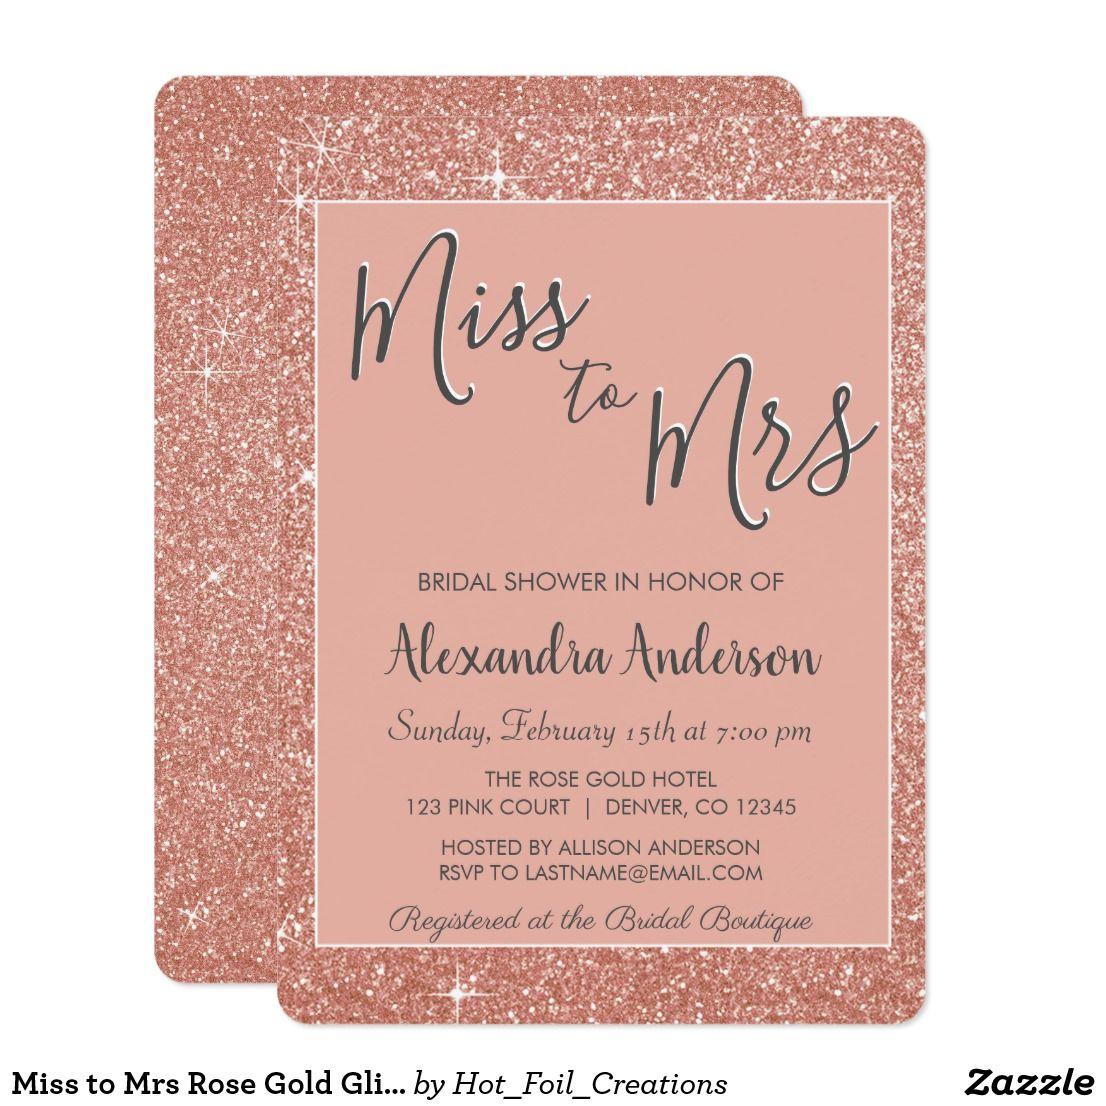 miss to mrs rose gold glitter bridal shower card miss to mrs pink rose gold faux sparkle glitter bridal shower party invitation